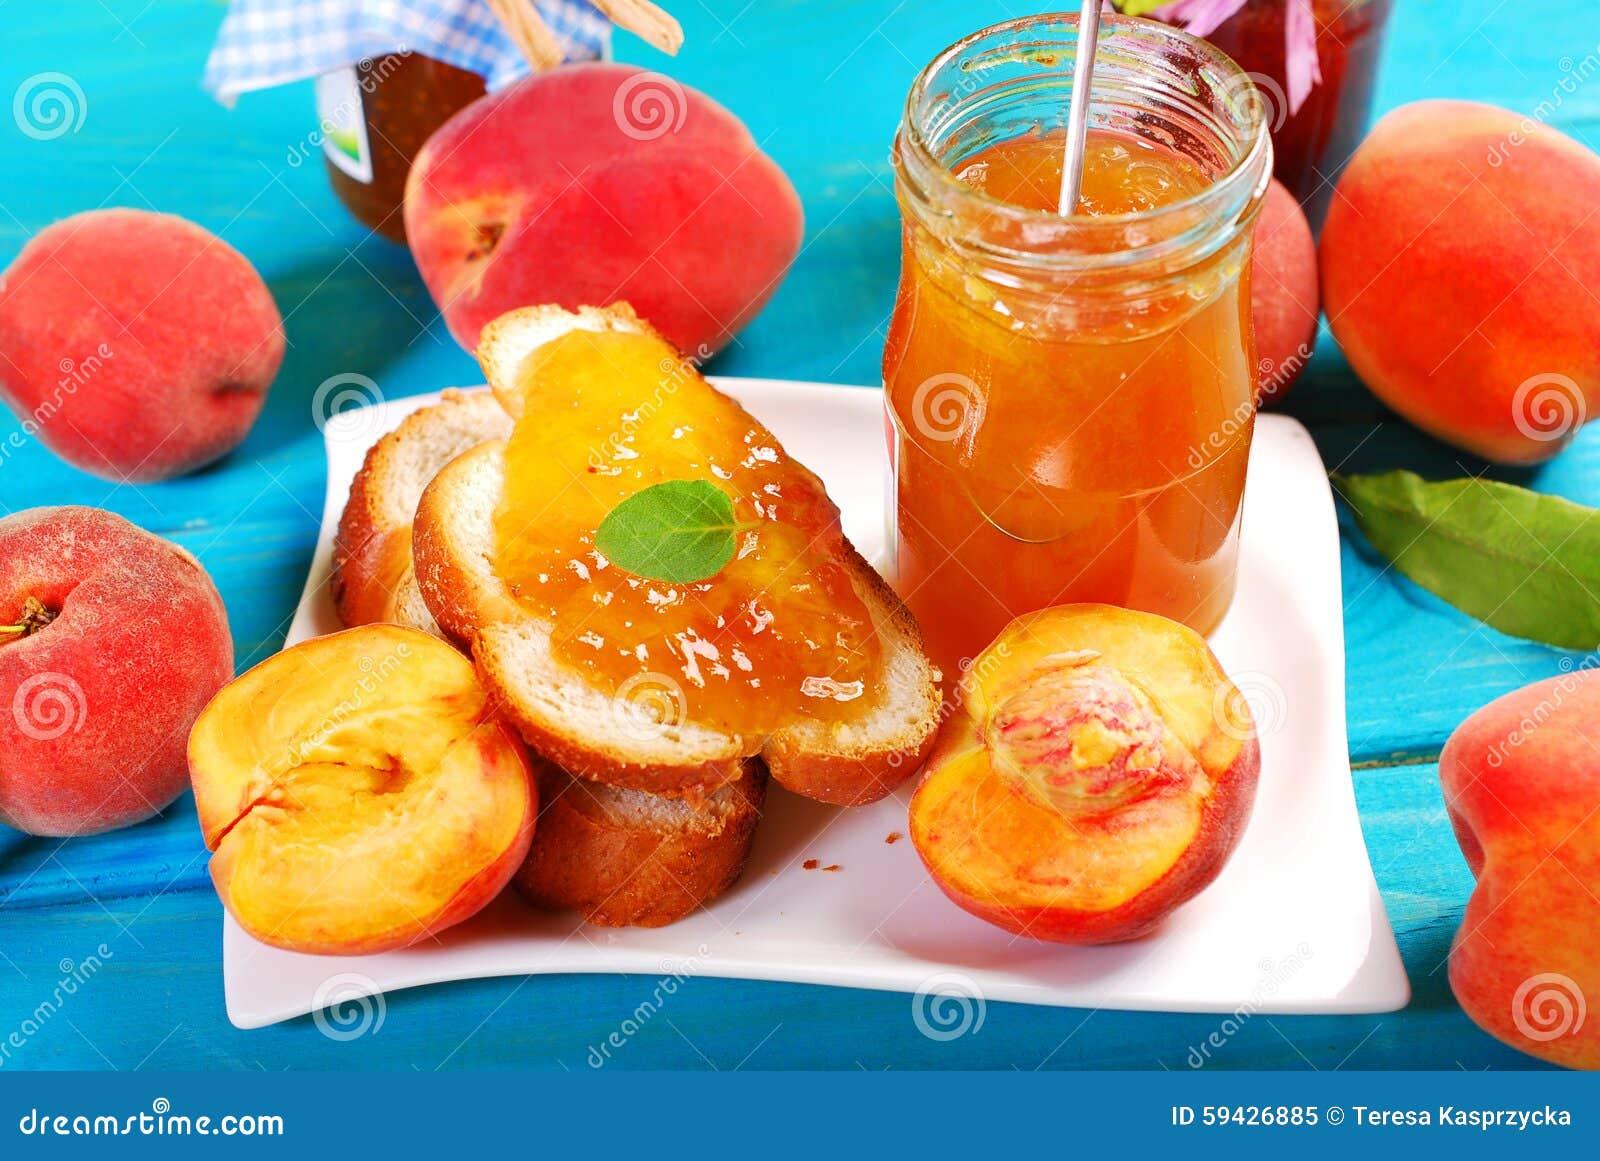 Homemade preserves-jar of peach jam,sweet bakery and fresh fruits on ...